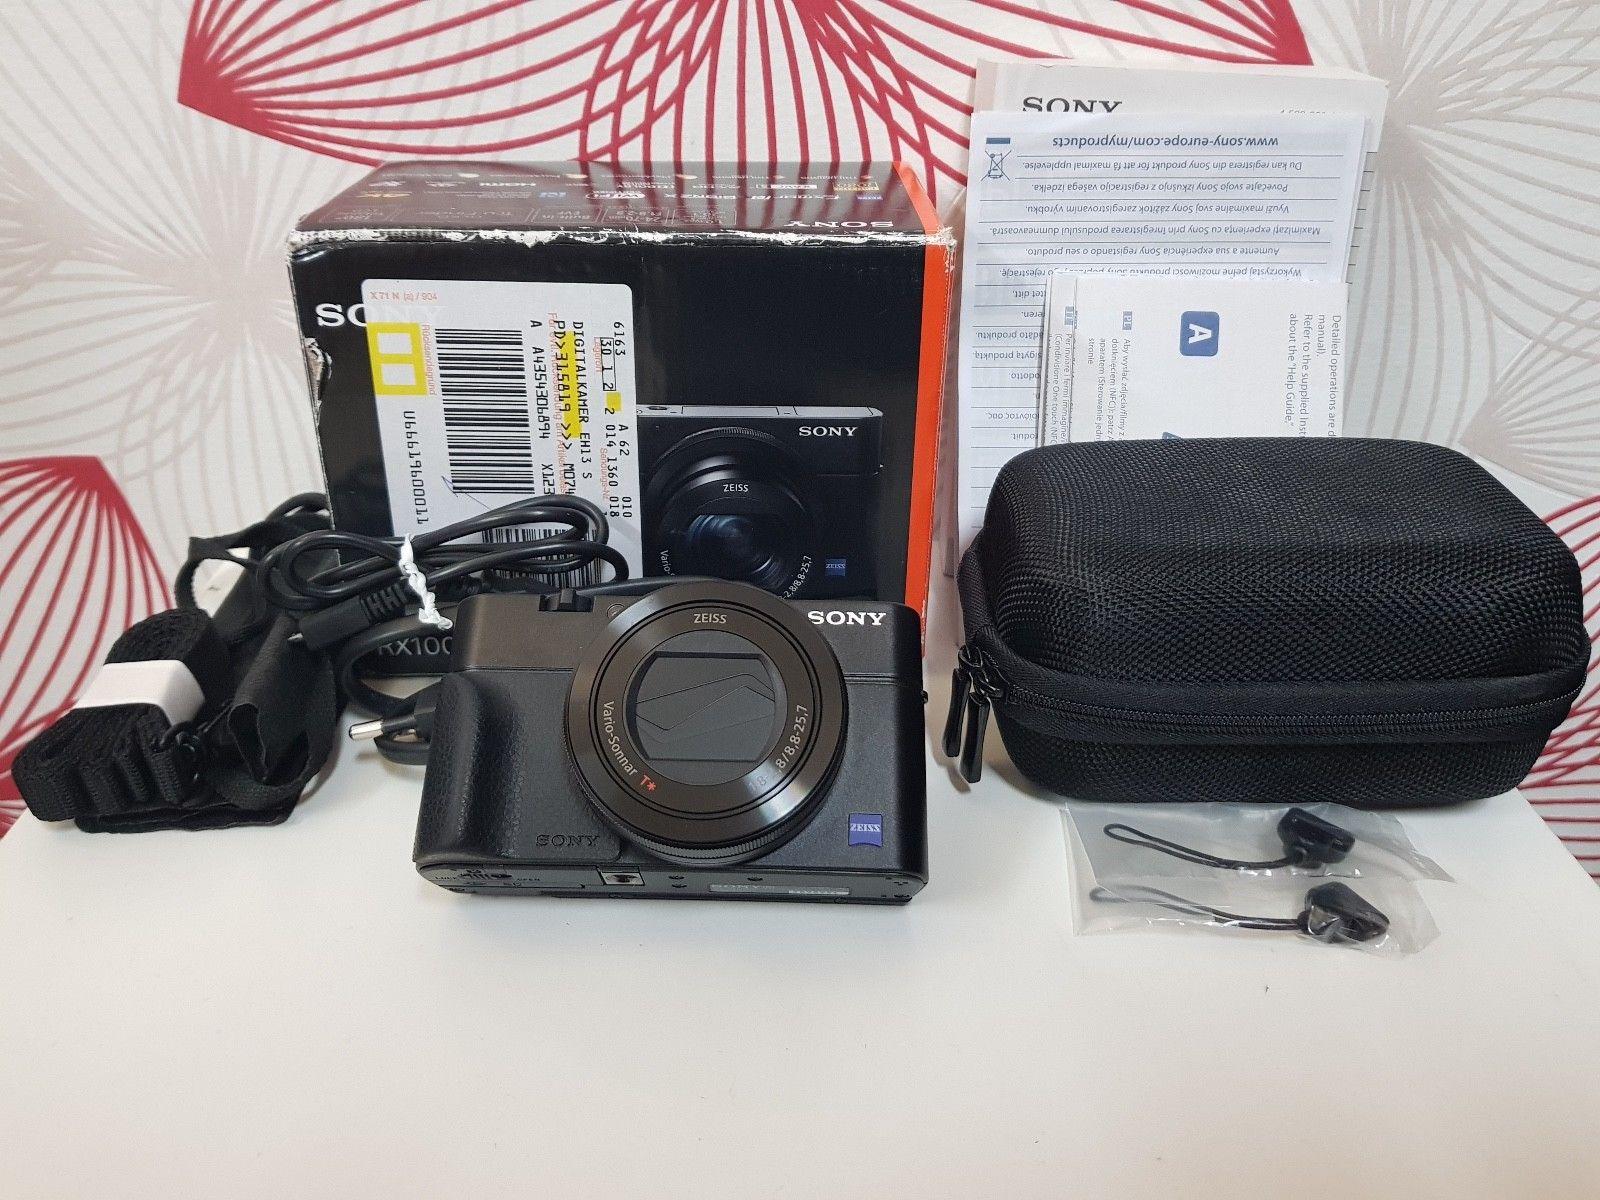 Sony DSC-RX100 III Digitalkamera RX100M3 schwarz black